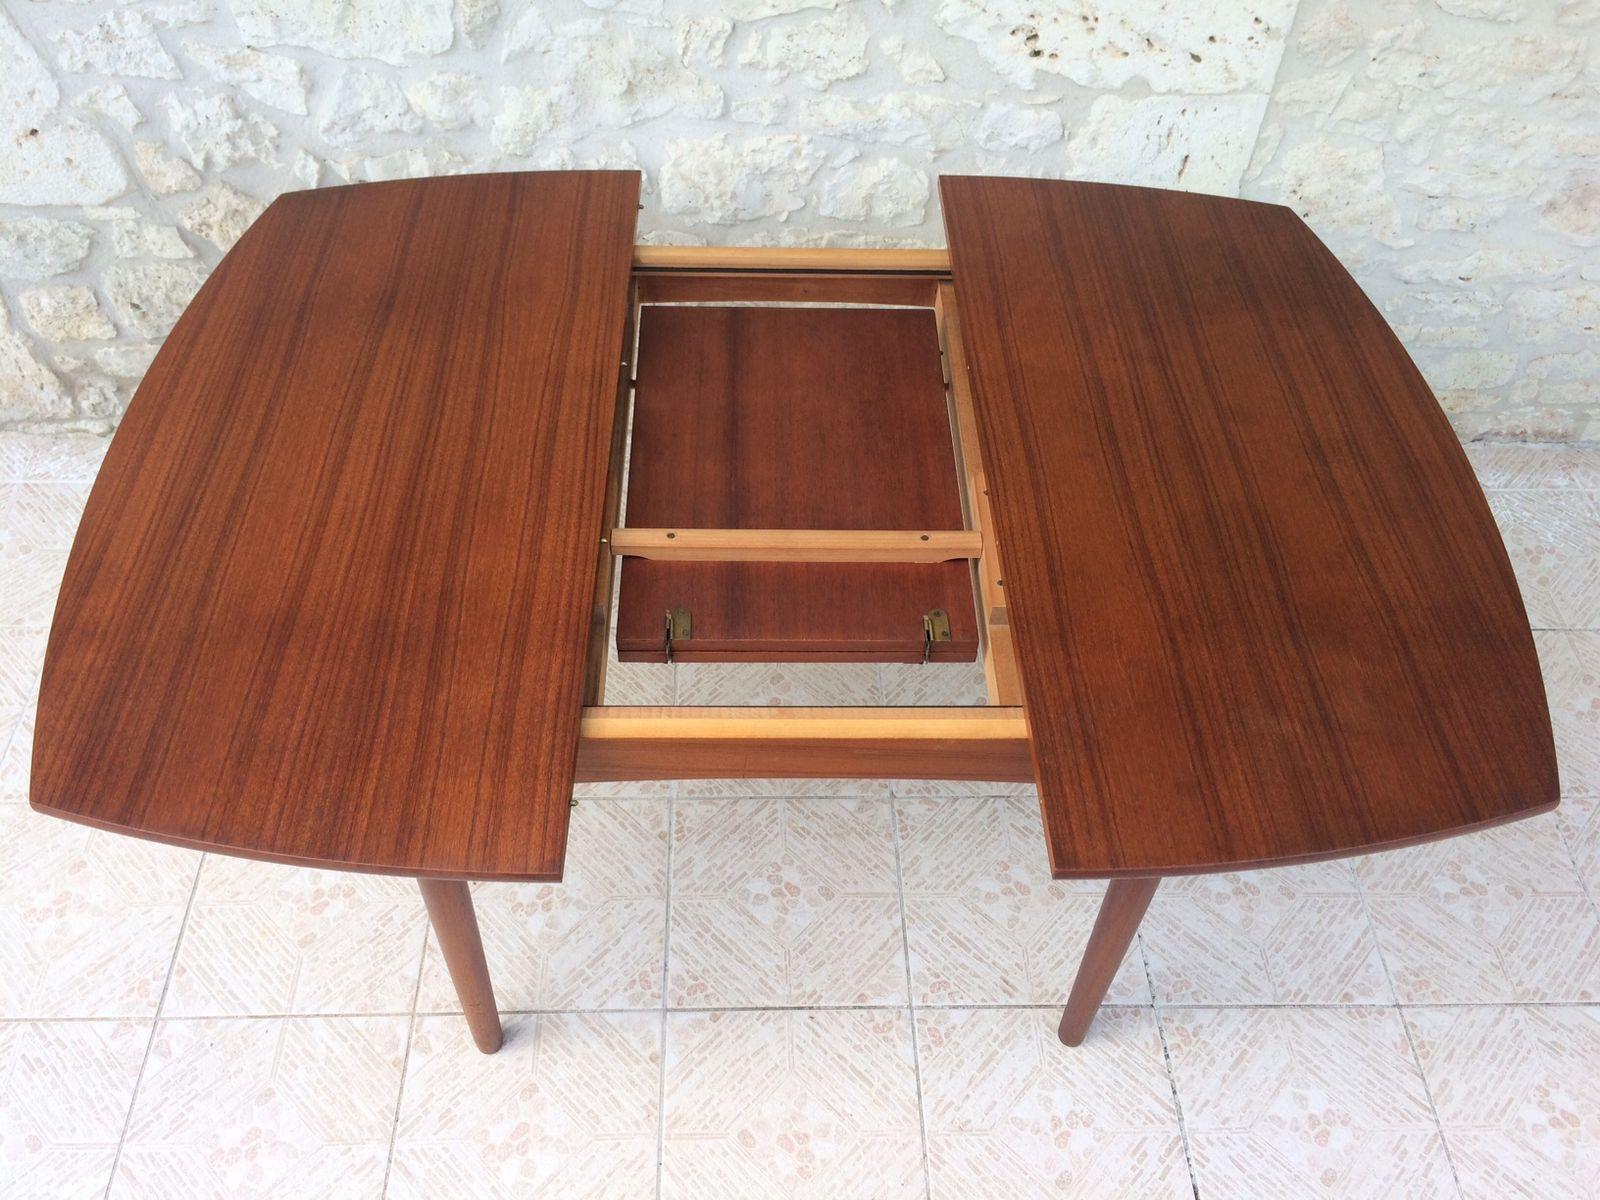 ausziehbarer skandinavischer teak esstisch mit verstecktem schmetterlingsfl gel 1960er bei. Black Bedroom Furniture Sets. Home Design Ideas